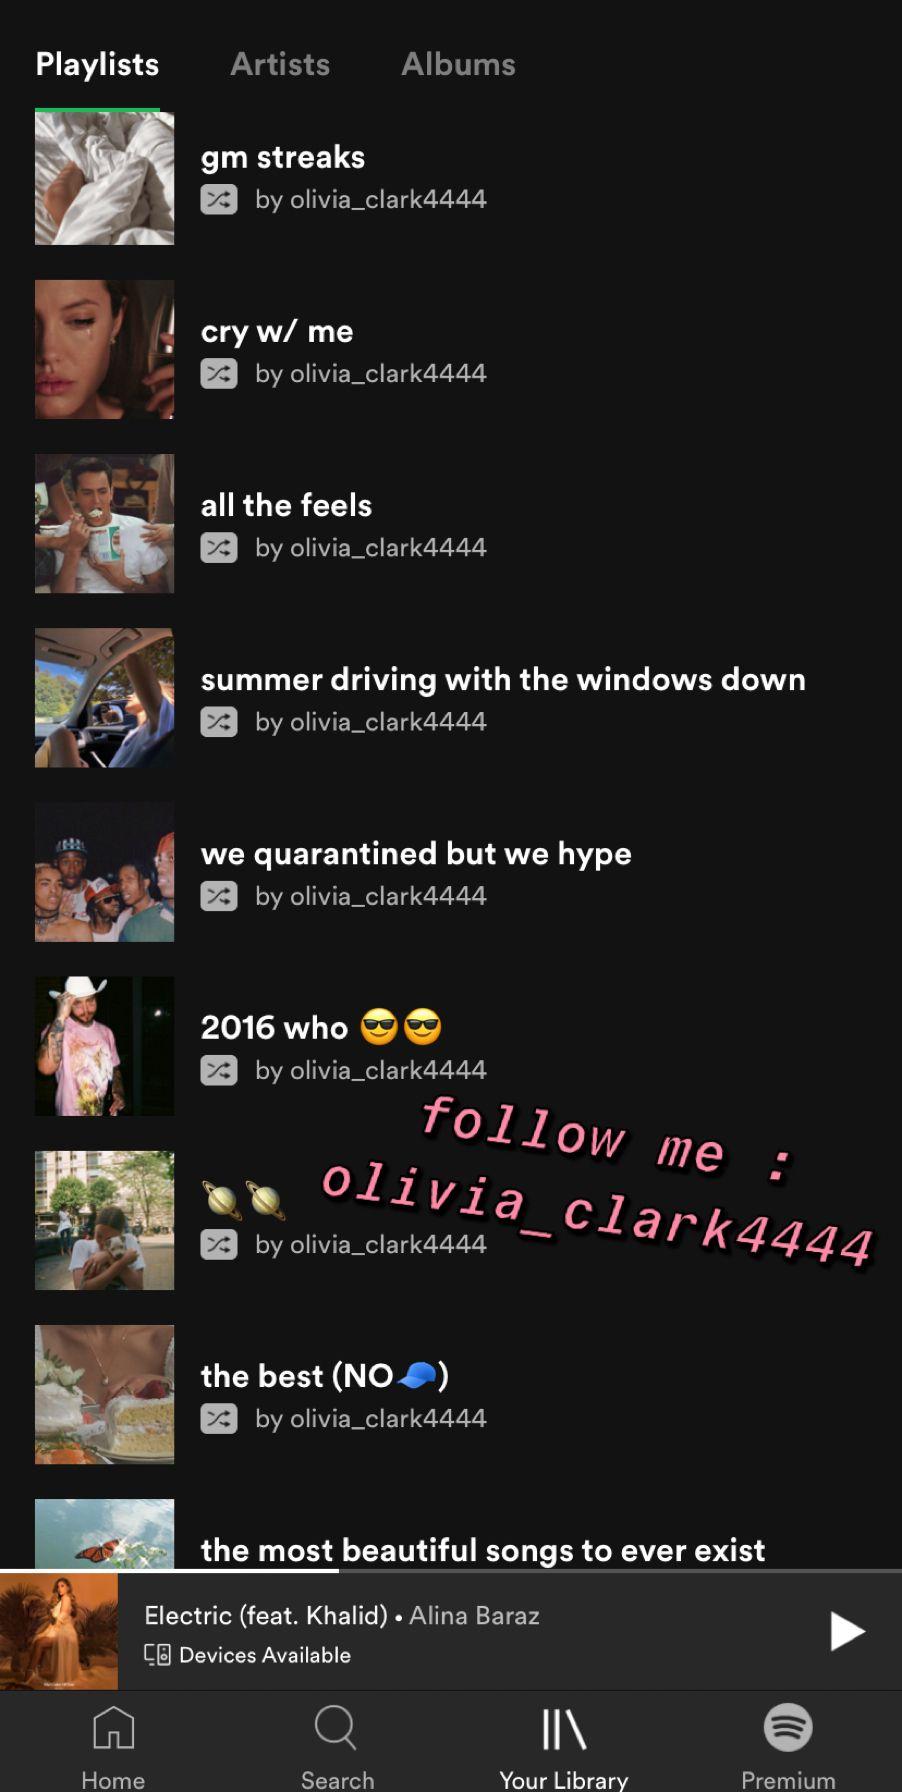 spotify olivia_clark4444 🌟🌟🌟 in 2020 Artist album